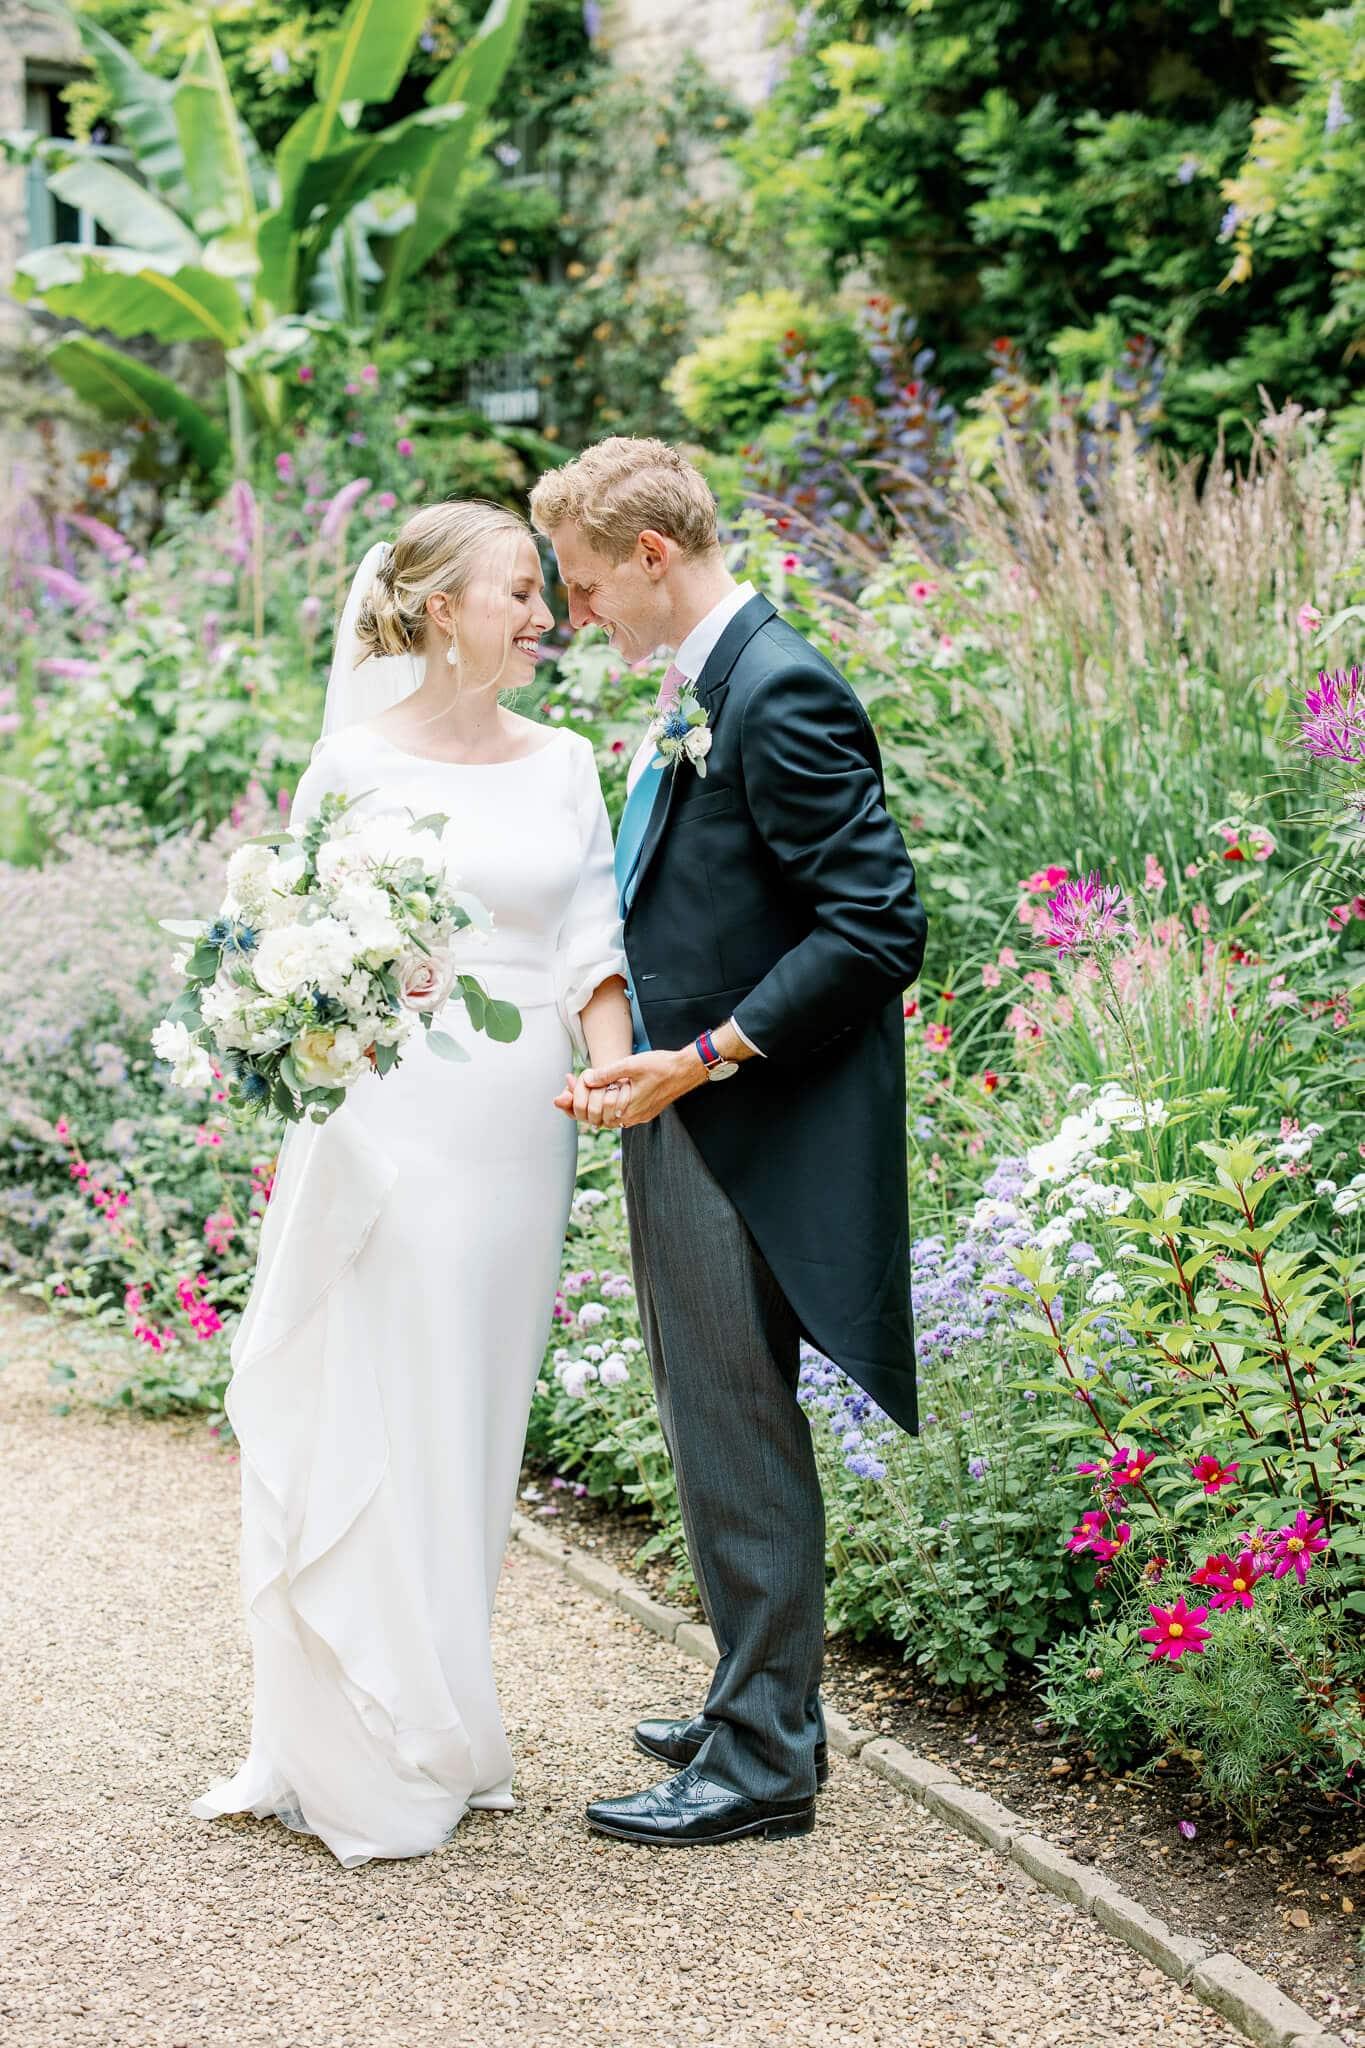 Worcester college wedding photographer in gardens